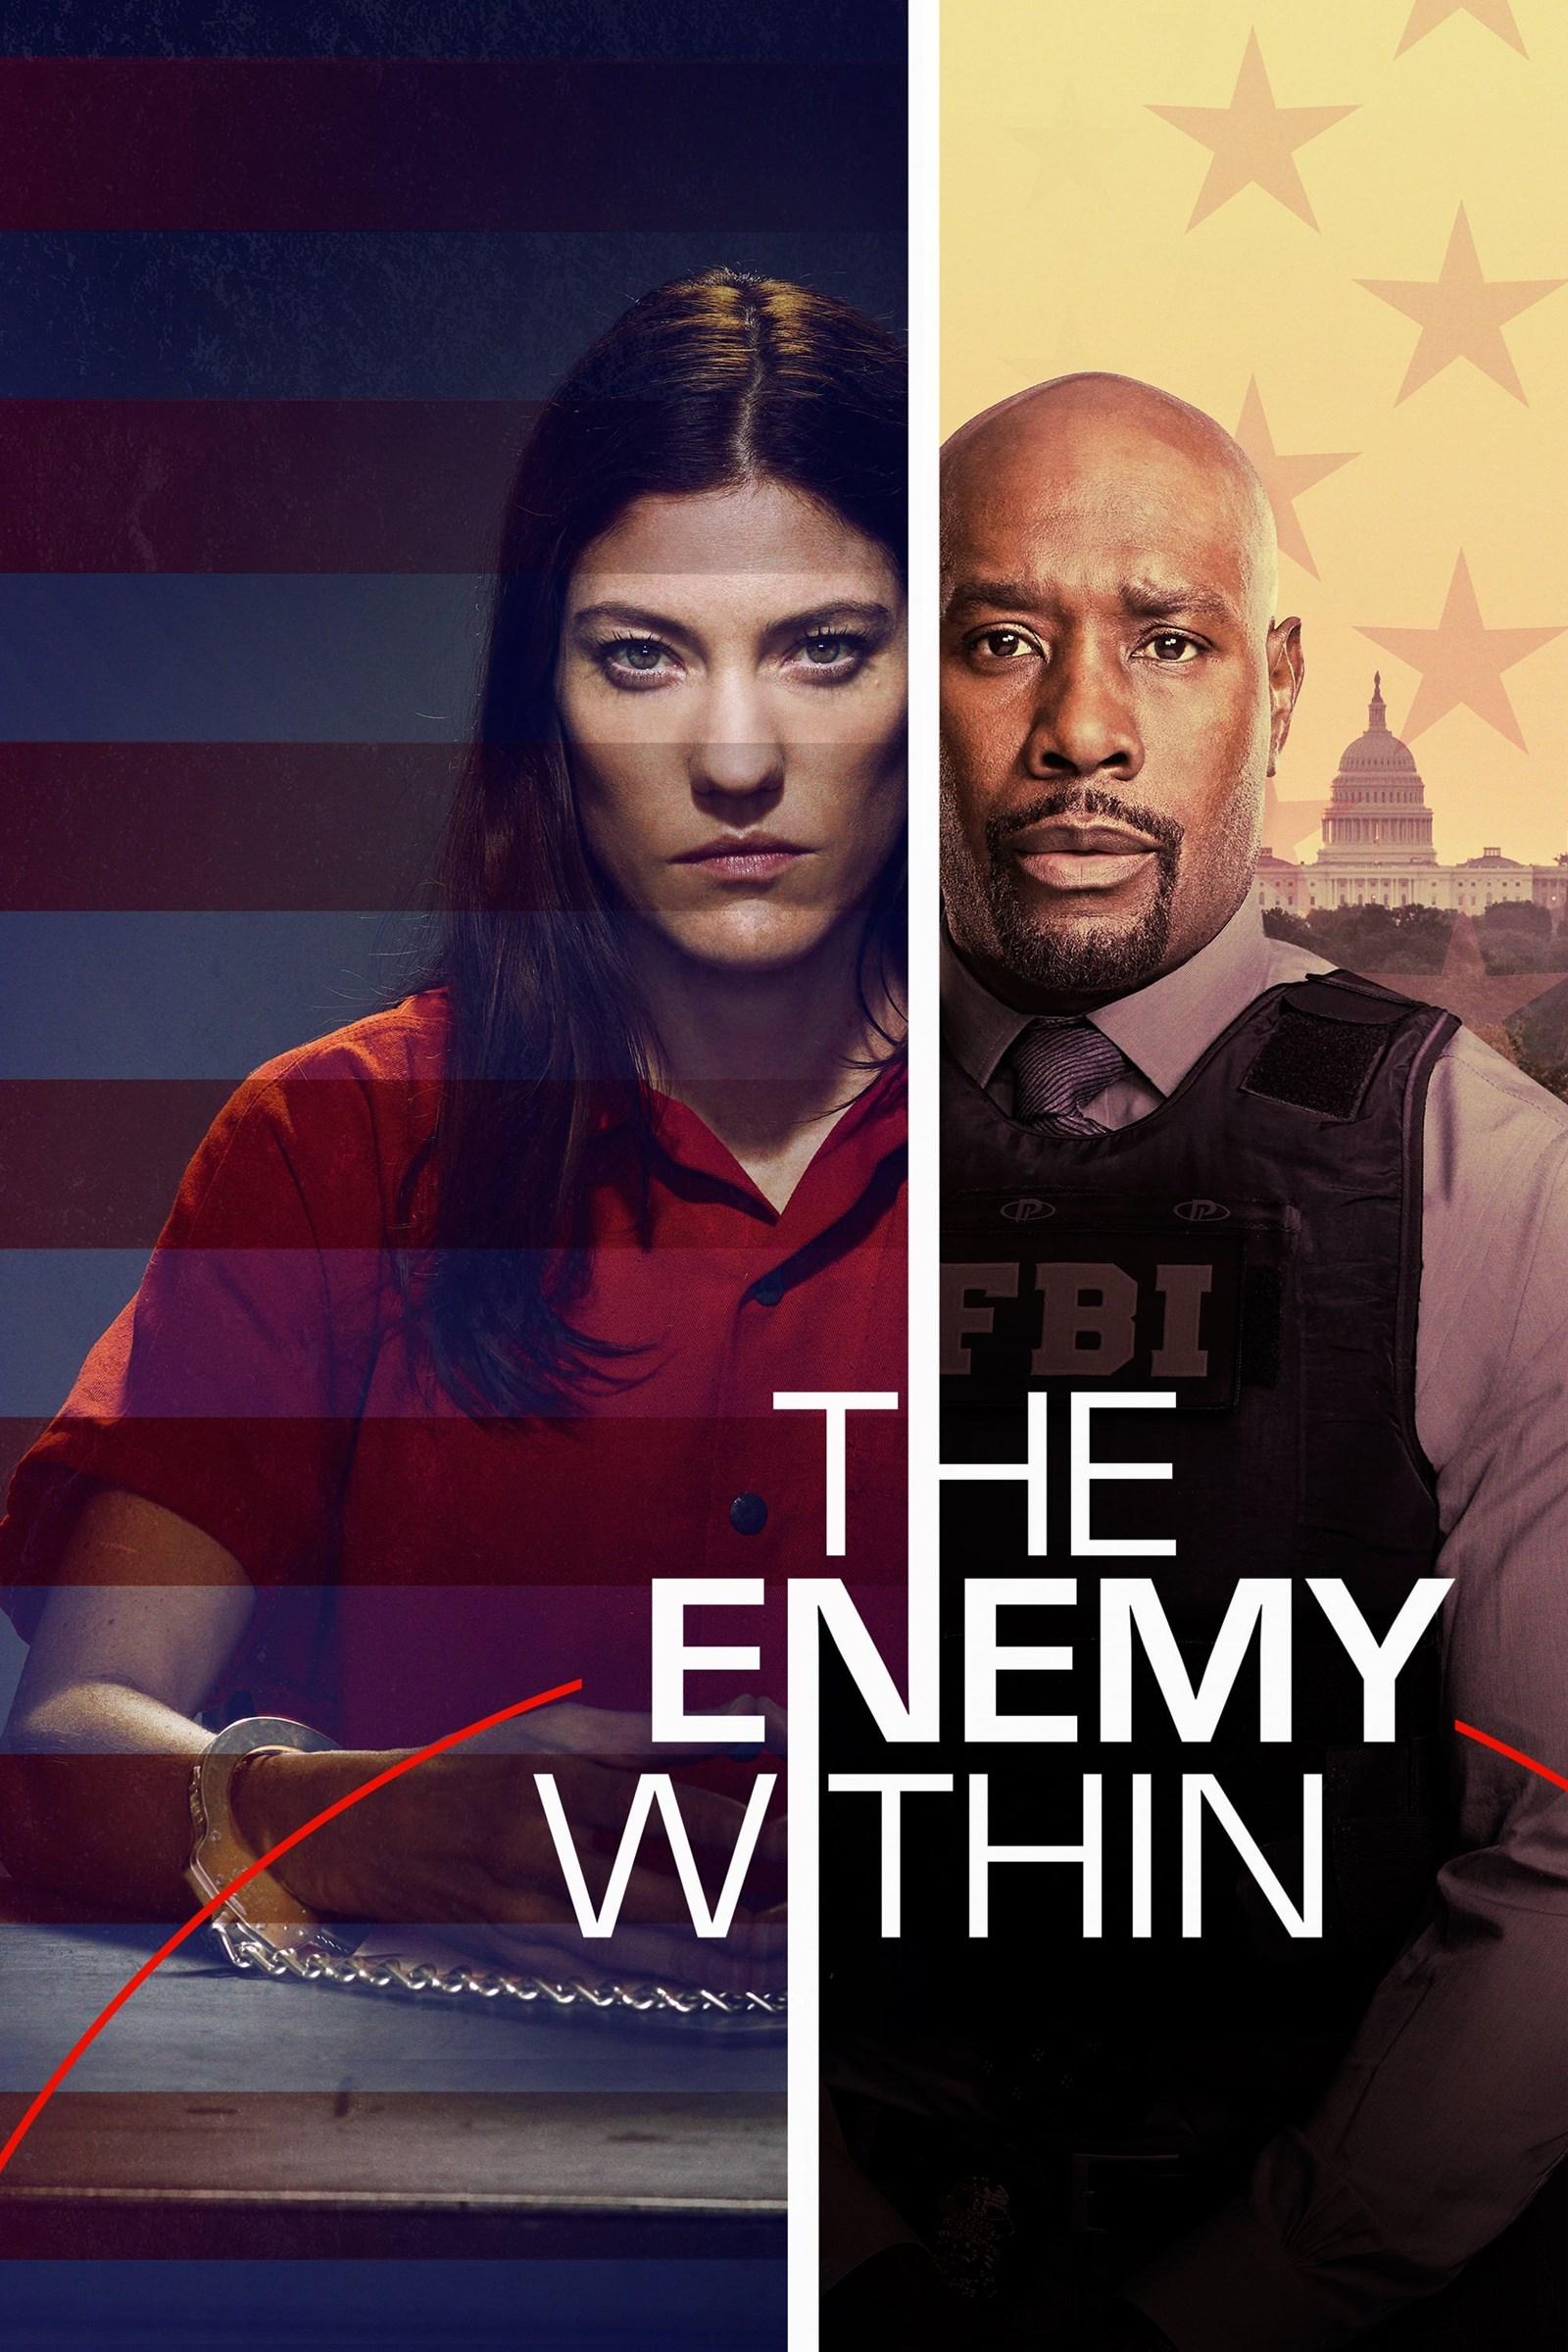 Subscene - The Enemy Within - First Season Farsi/Persian subtitle